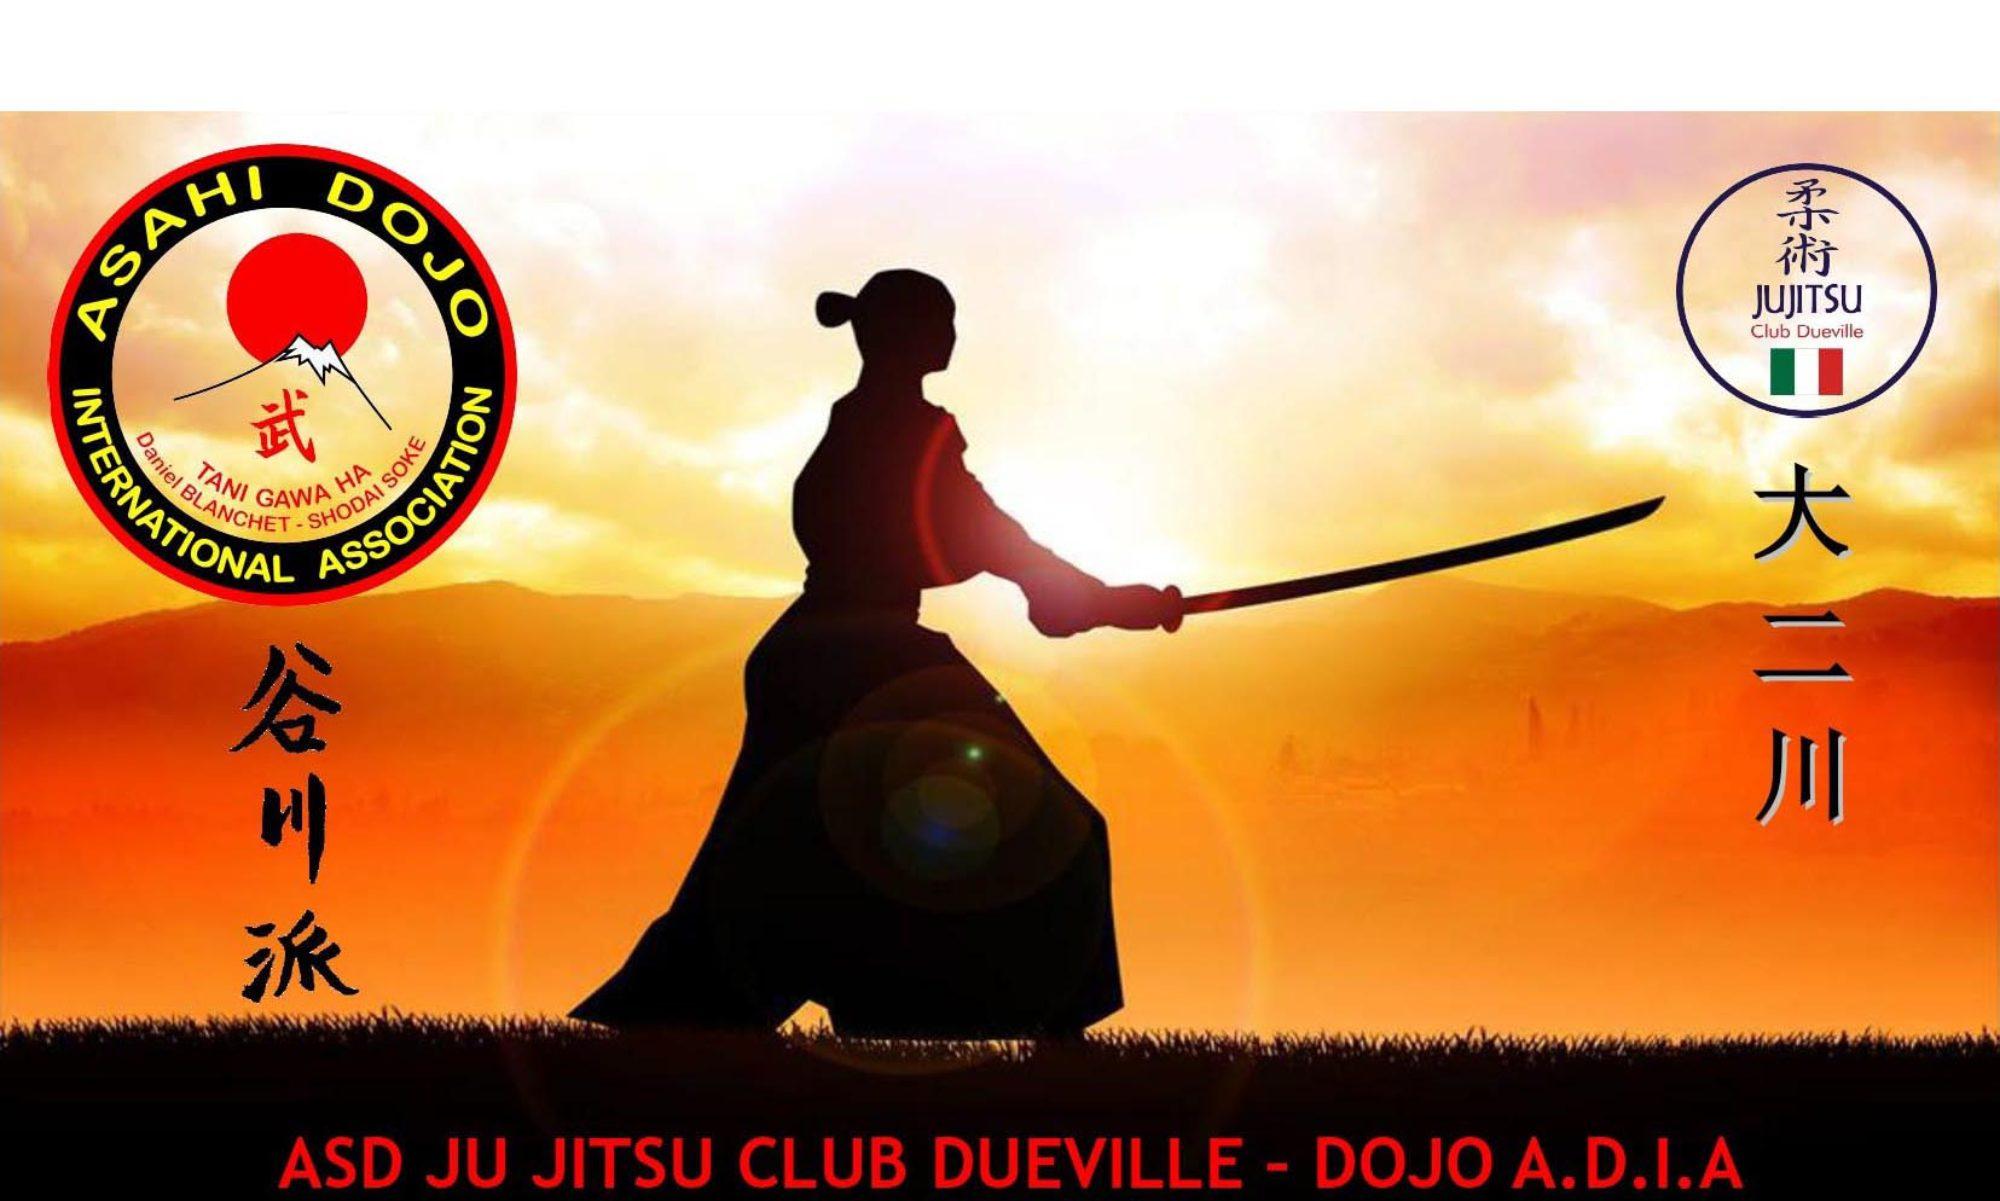 ASD JU JITSU CLUB DUEVILLE DOJO A.D.I.A